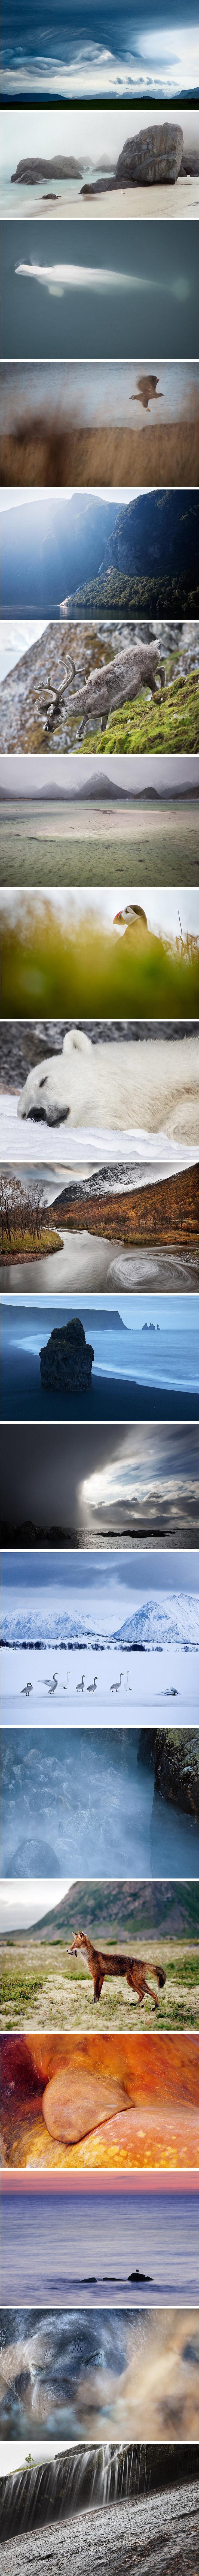 Nature Photography: Fredik Odman